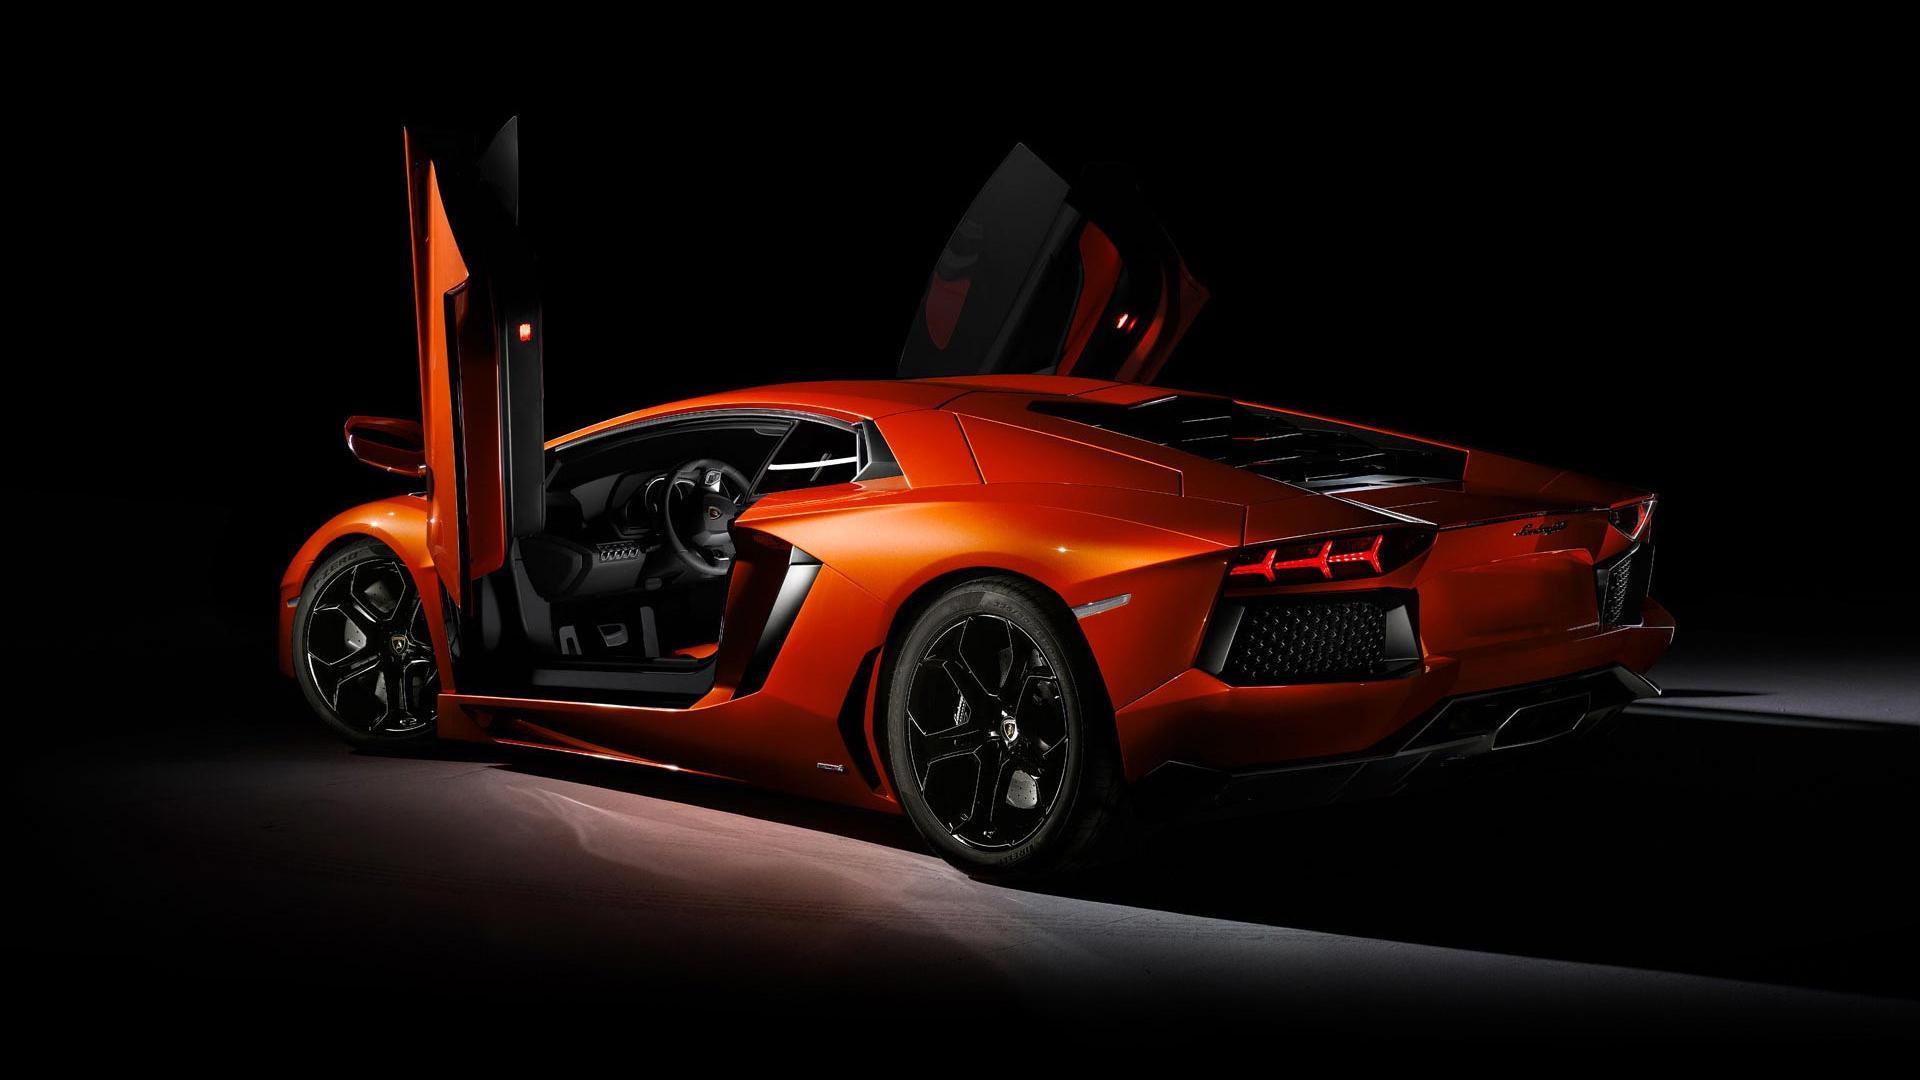 Lamborghini Hd Wallpapers 1080P   Wallpaper HD Base 1920x1080